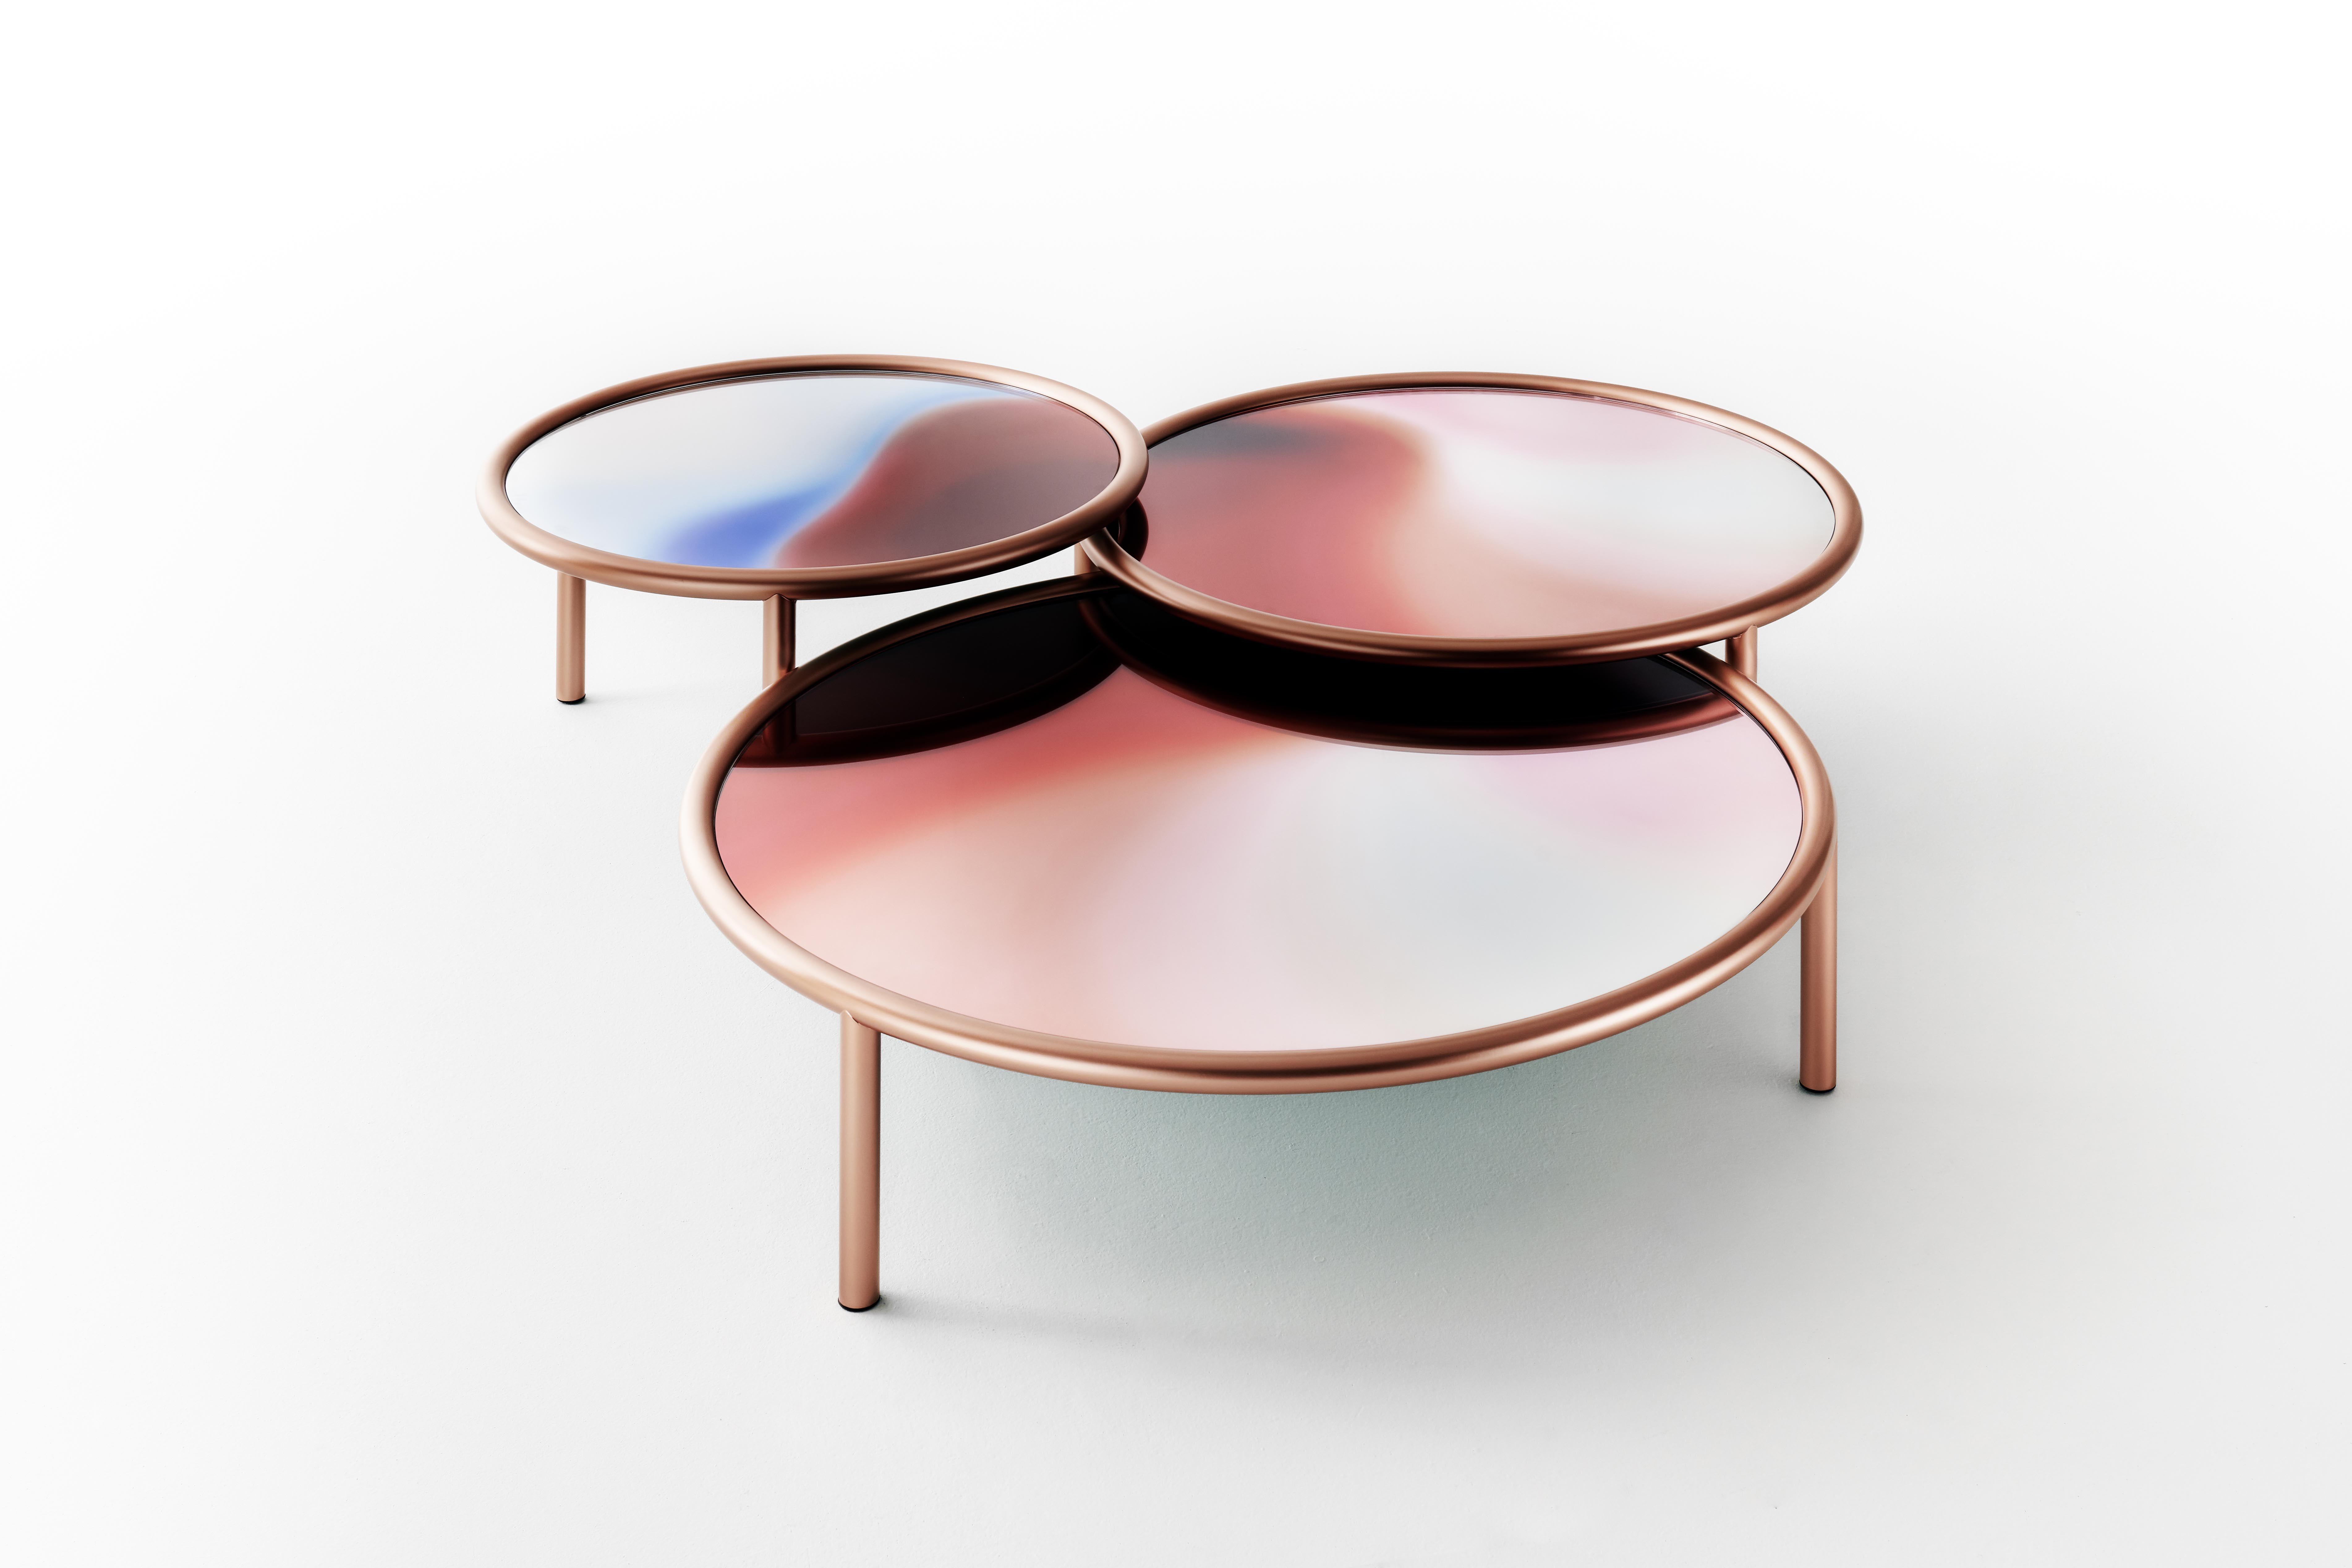 Designs Archive Patricia Urquiola Round Glass Coffee Table Glass Coffee Table Milan Design Week [ jpg ]